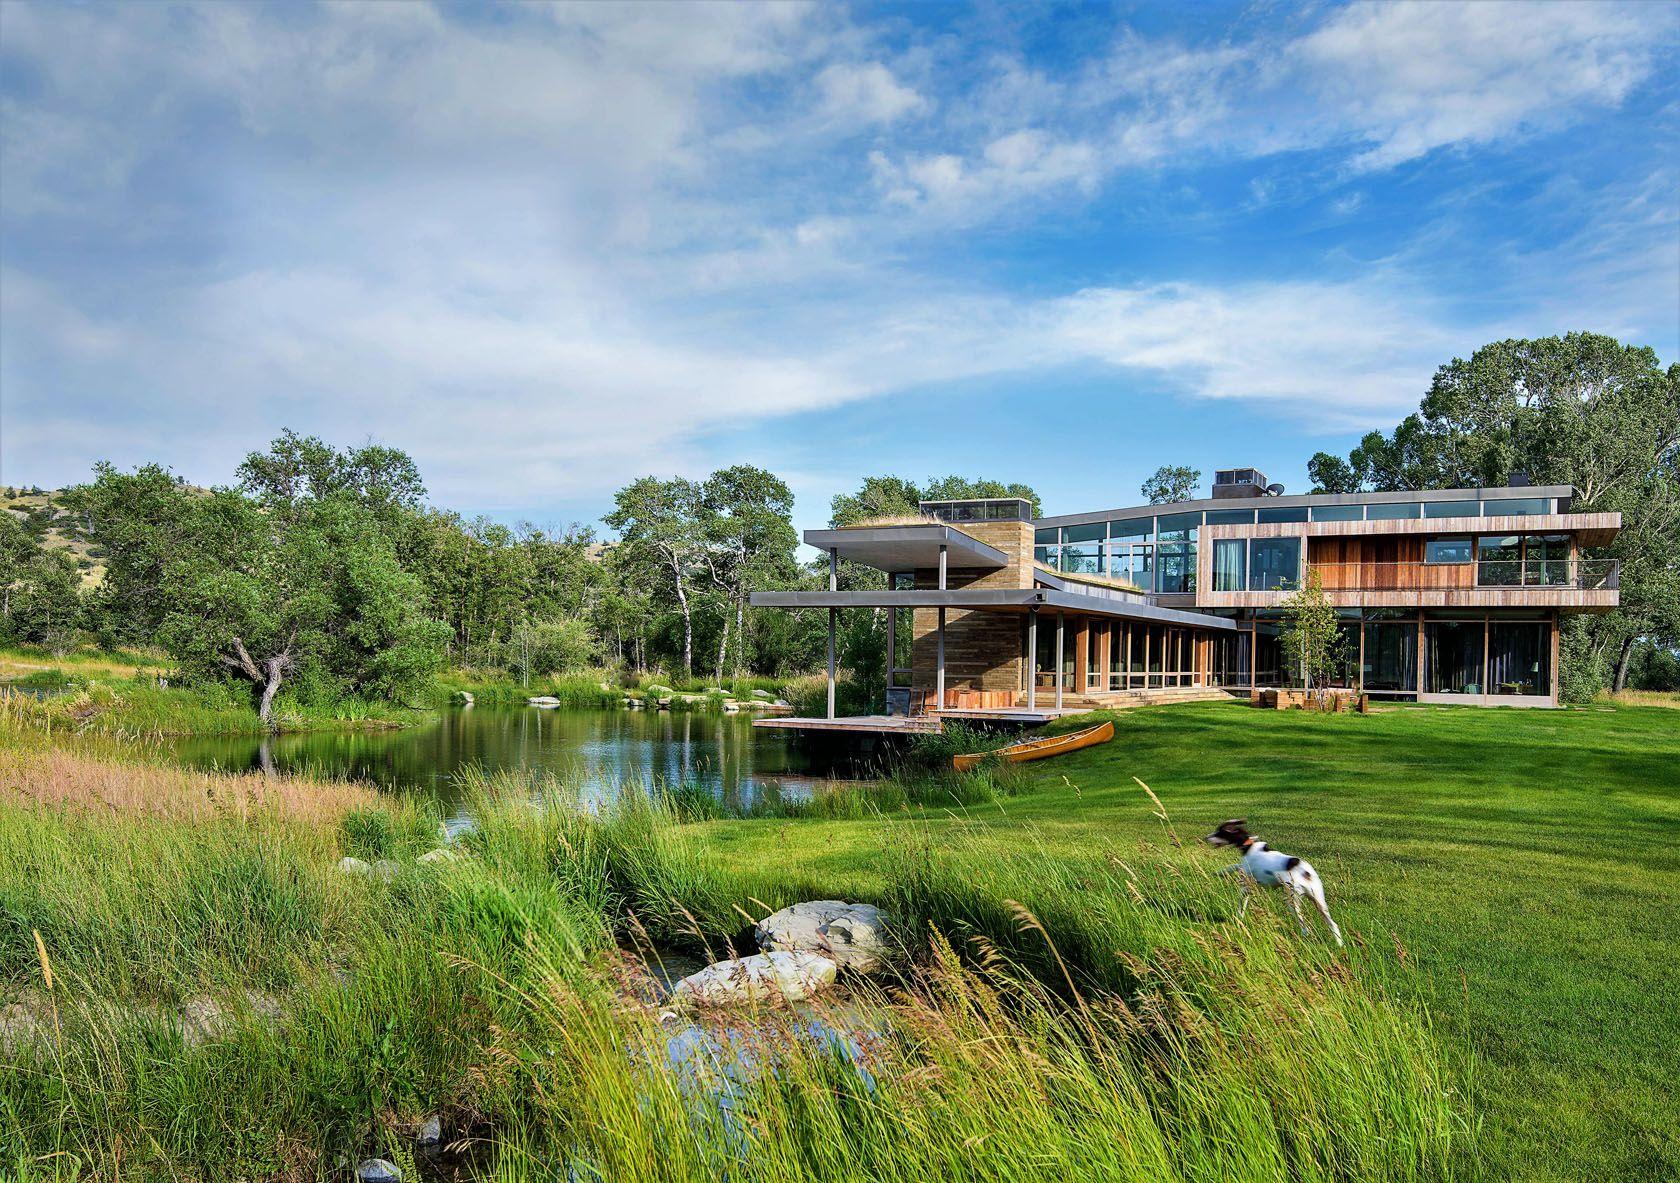 8 4 8 500 000 3 Bedrooms 3 5 Bathrooms 3 800 Sq Ft 1 261 Acres High Alpine Ranch Big Big Timber Big Timber Montana Landscape Contractor